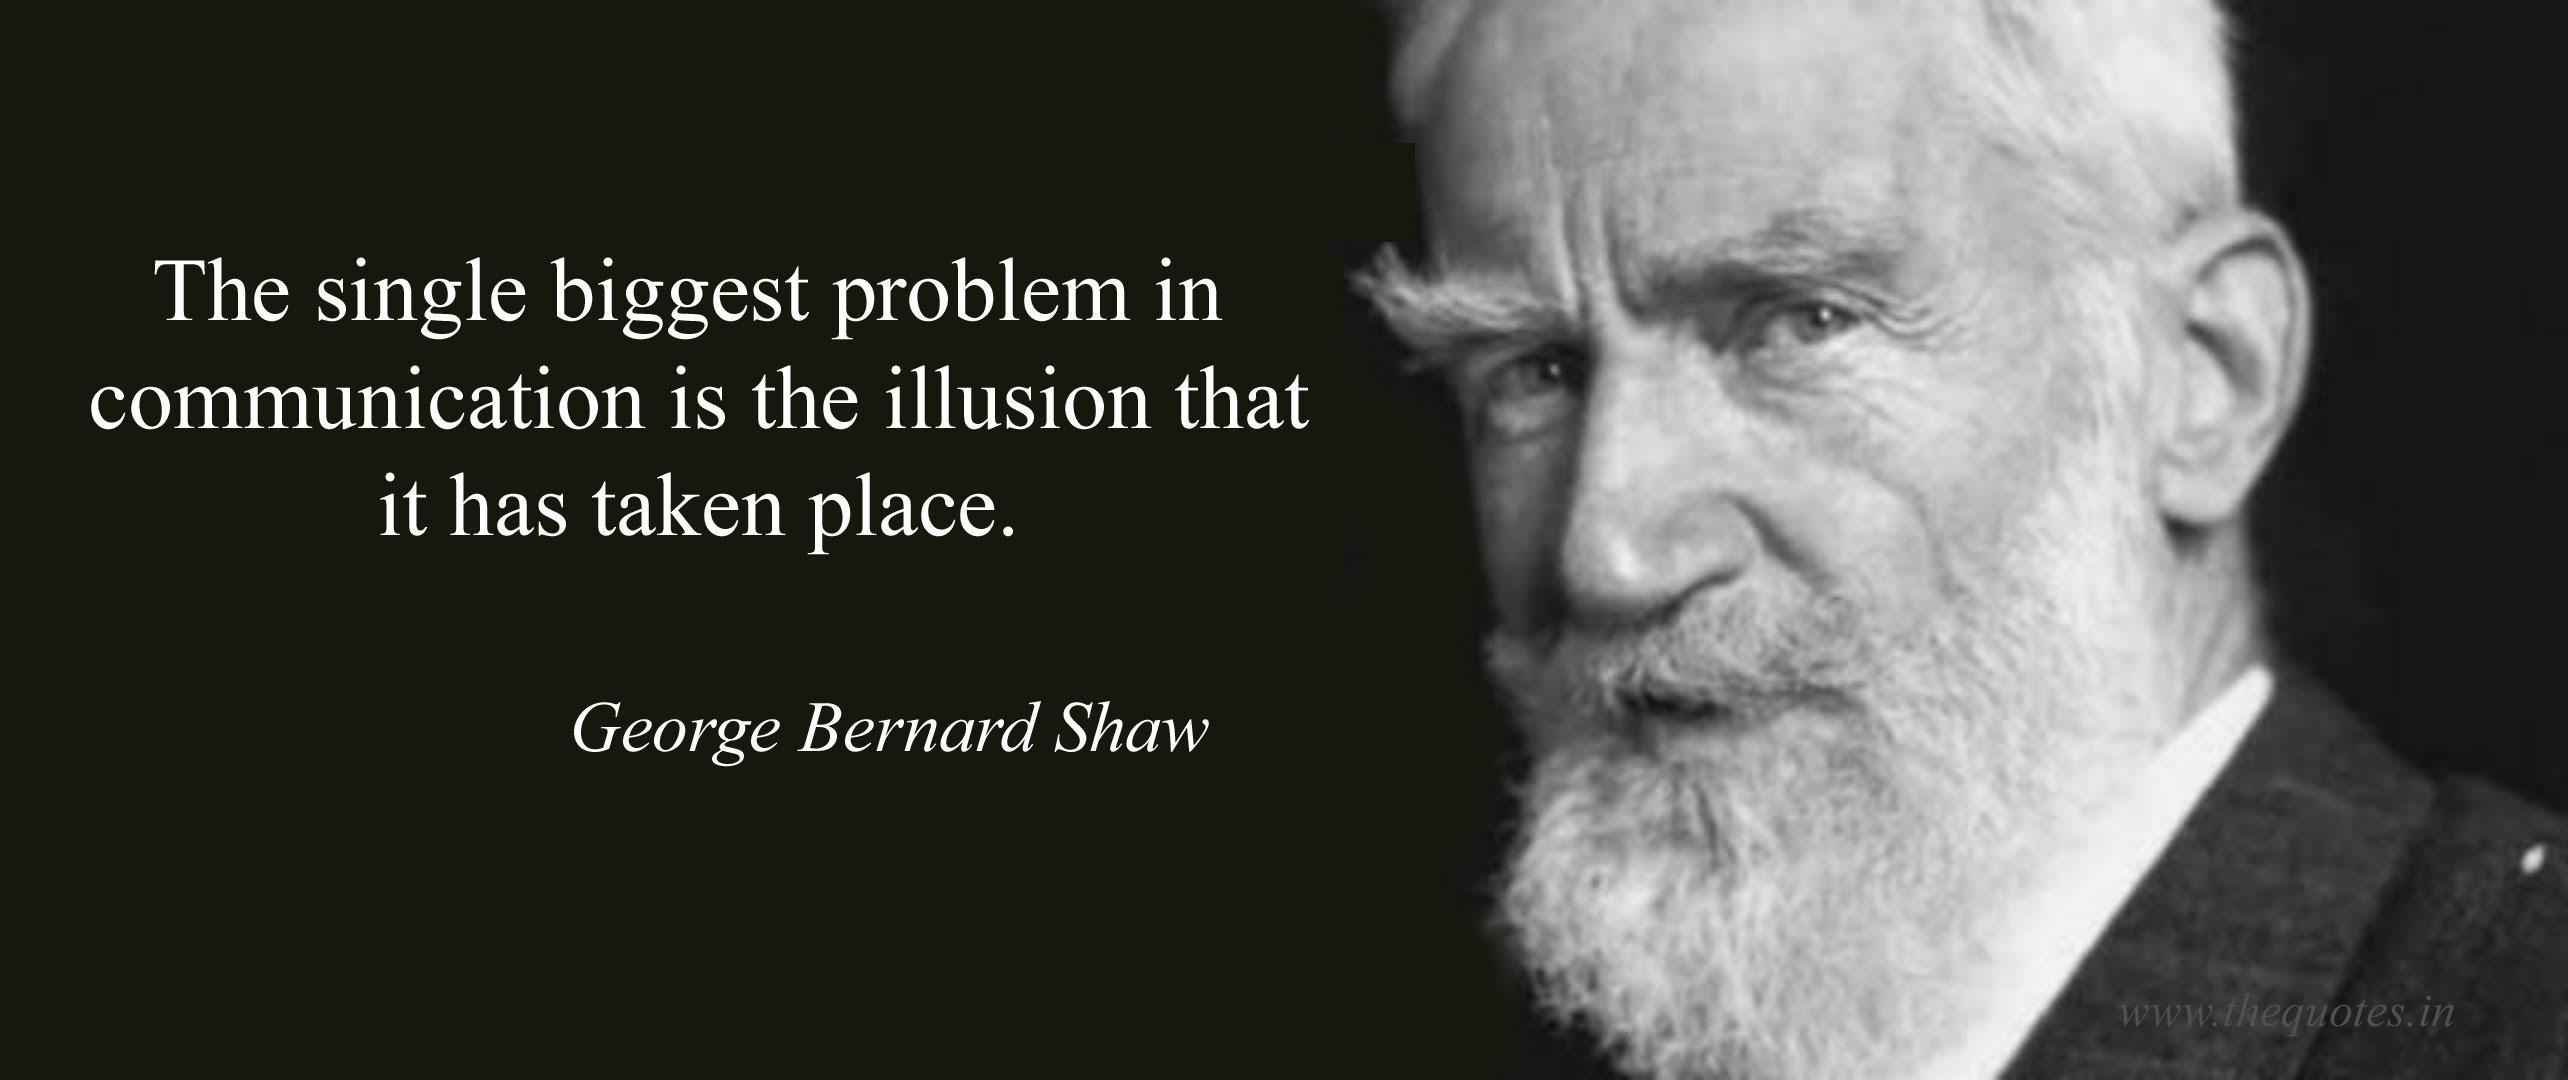 Z cyklu: aforyzmy - George Bernard Shaw